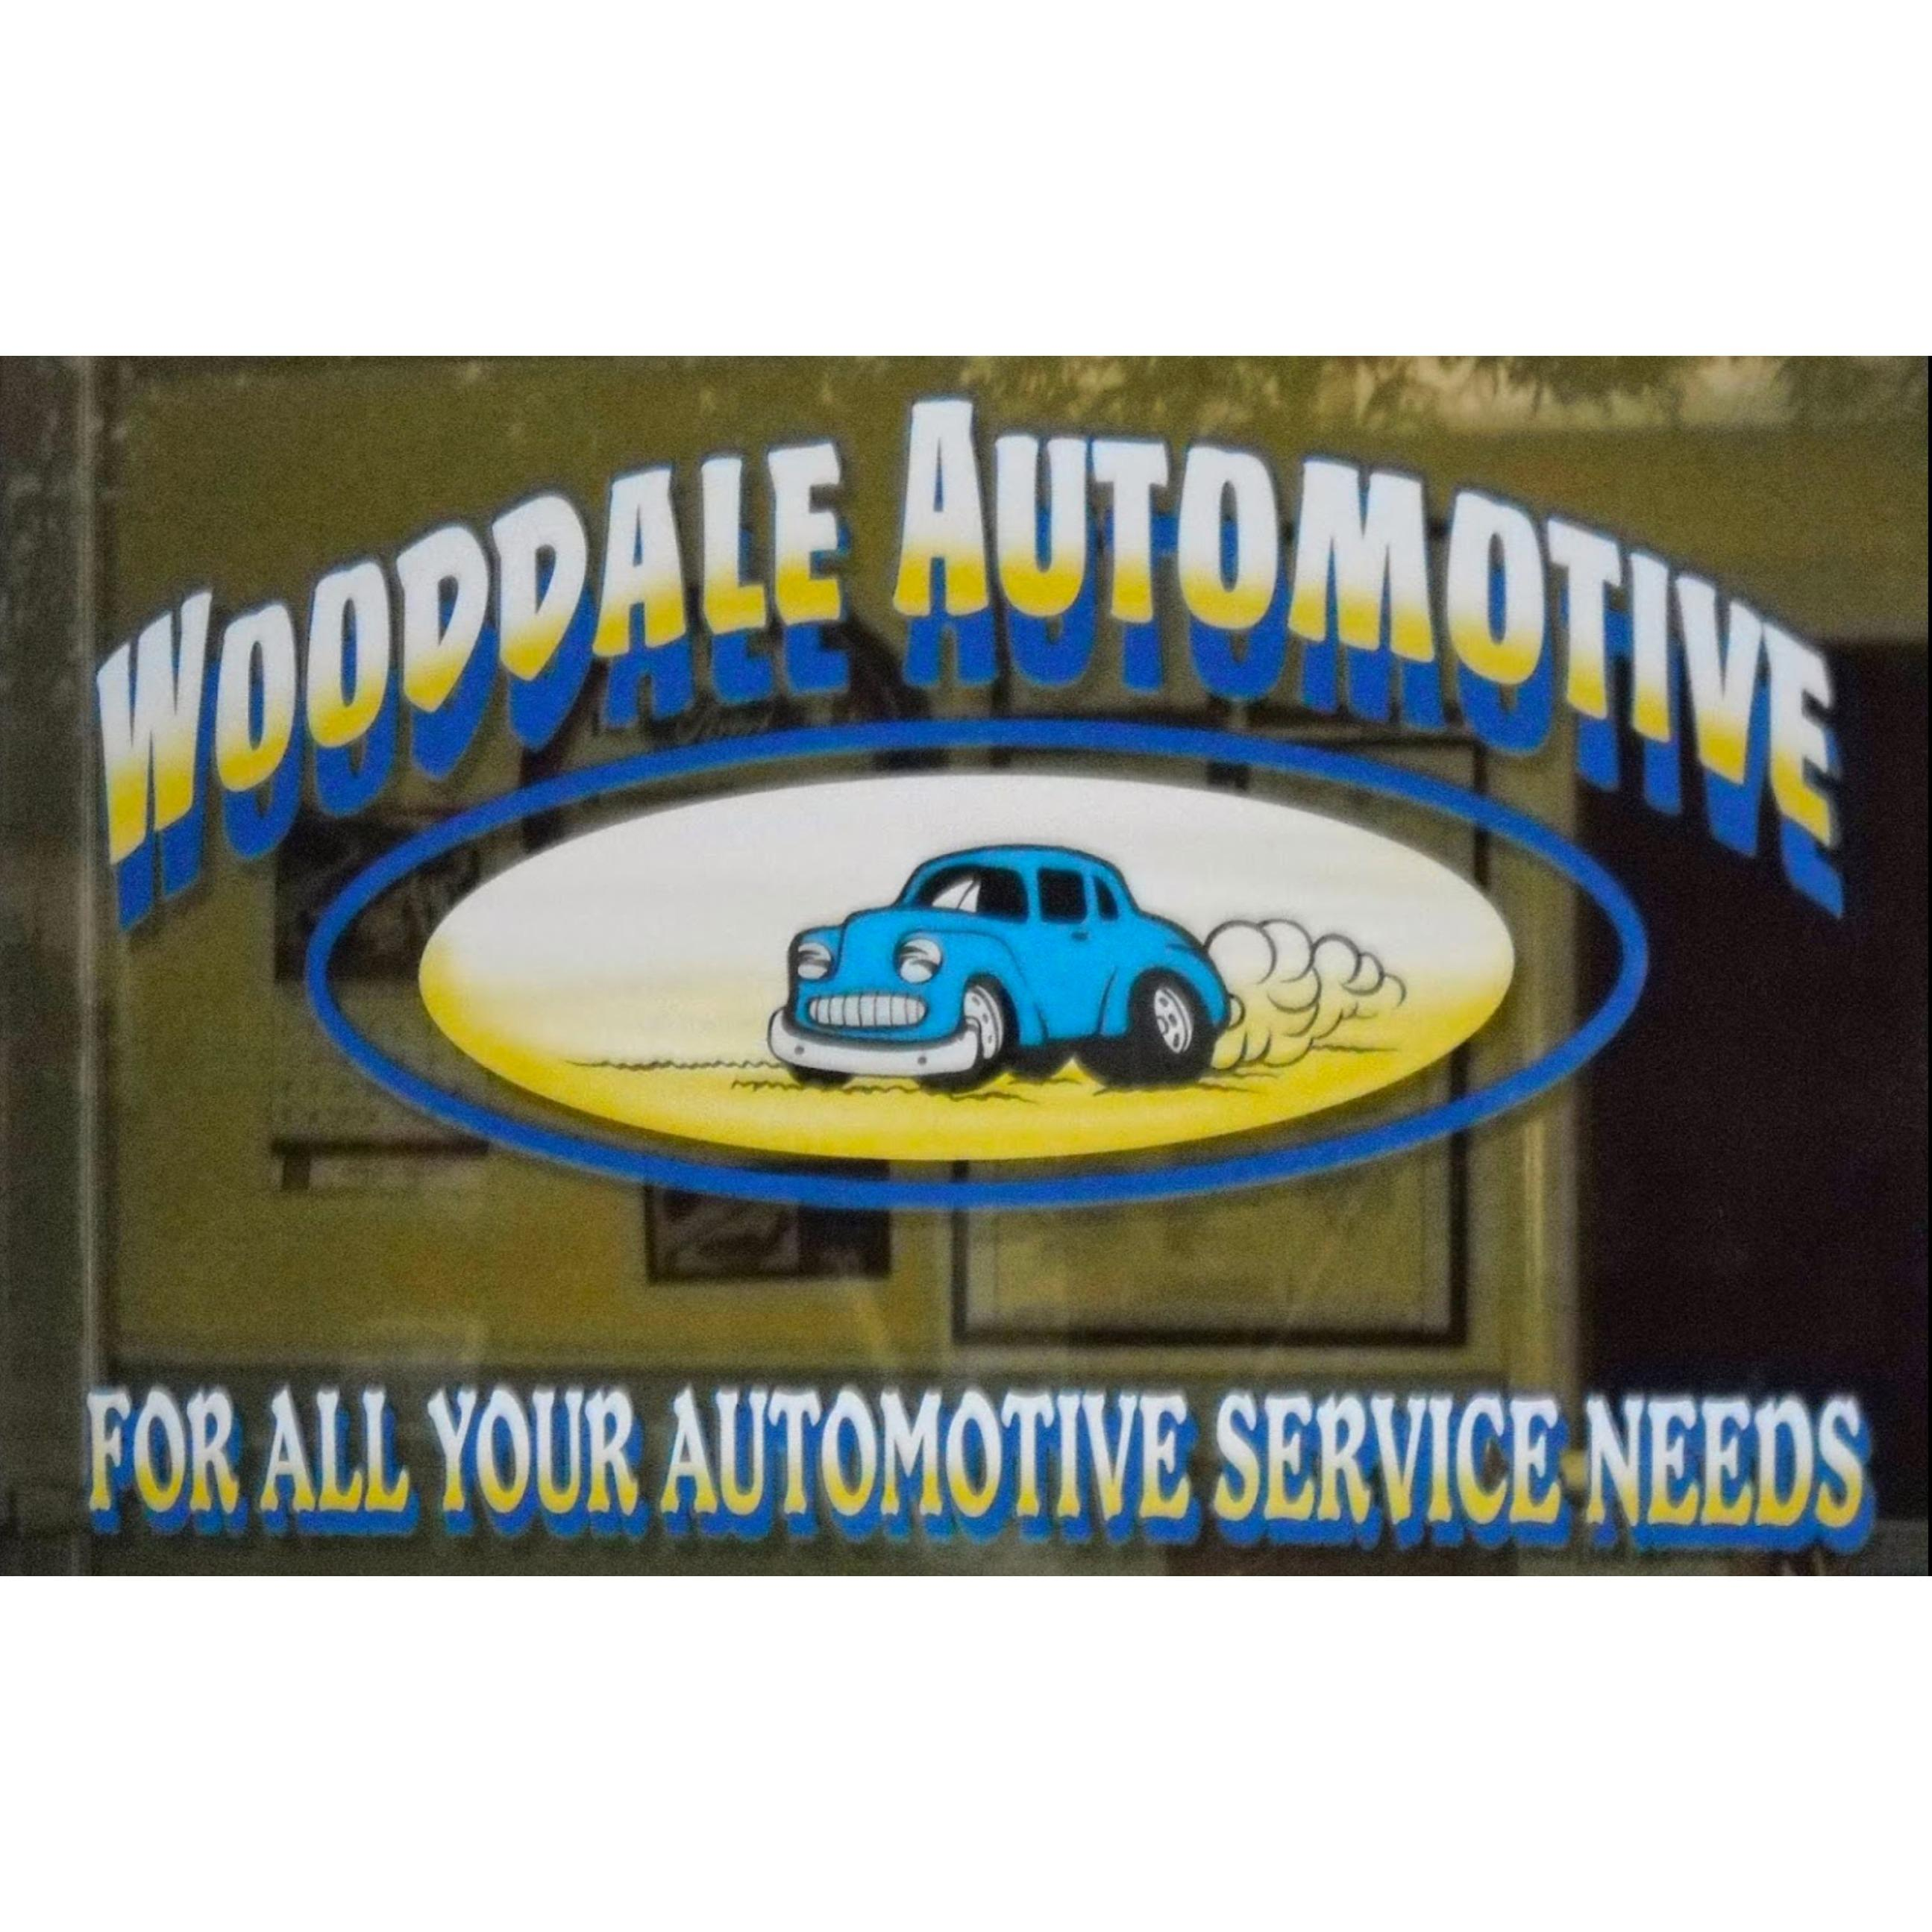 Wooddale Automotive Specialists, Inc.